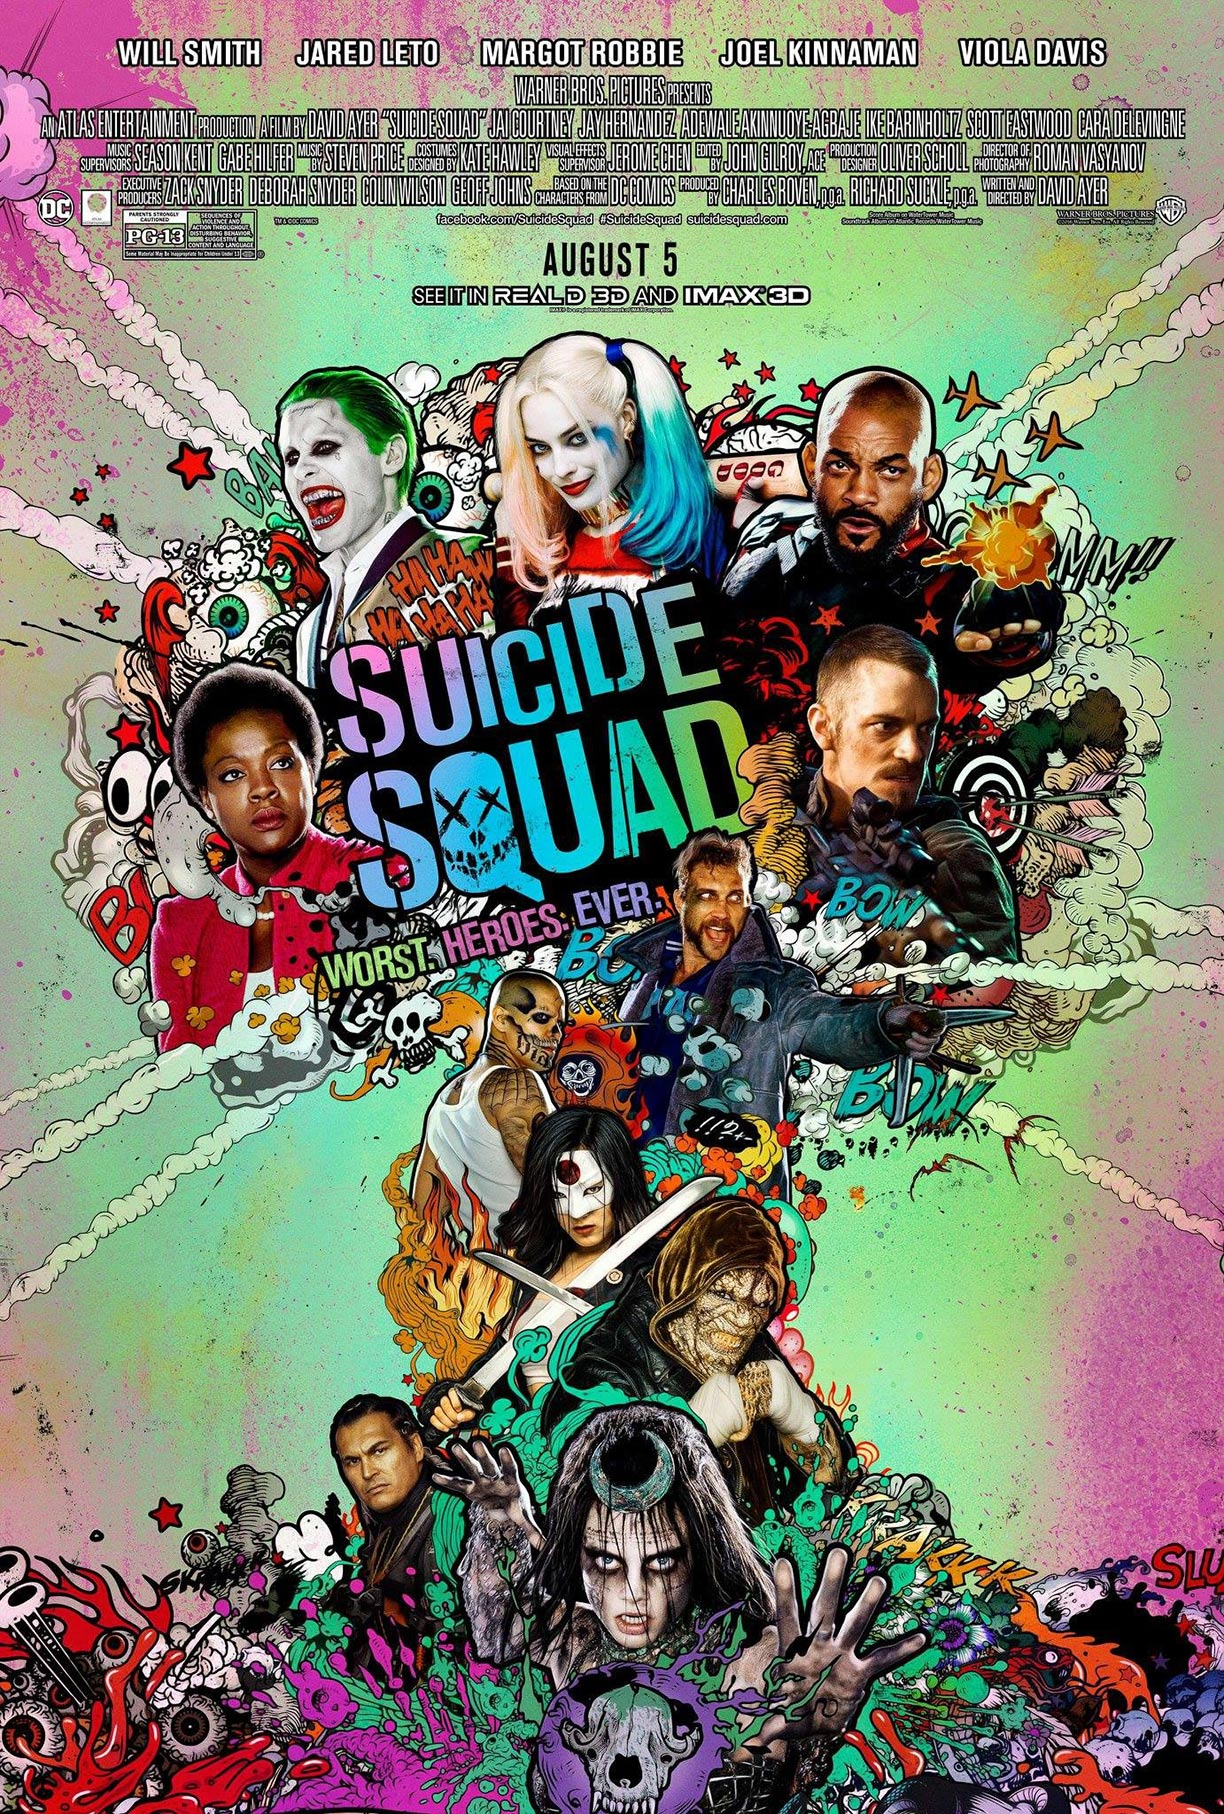 [Suicide Squad poster]